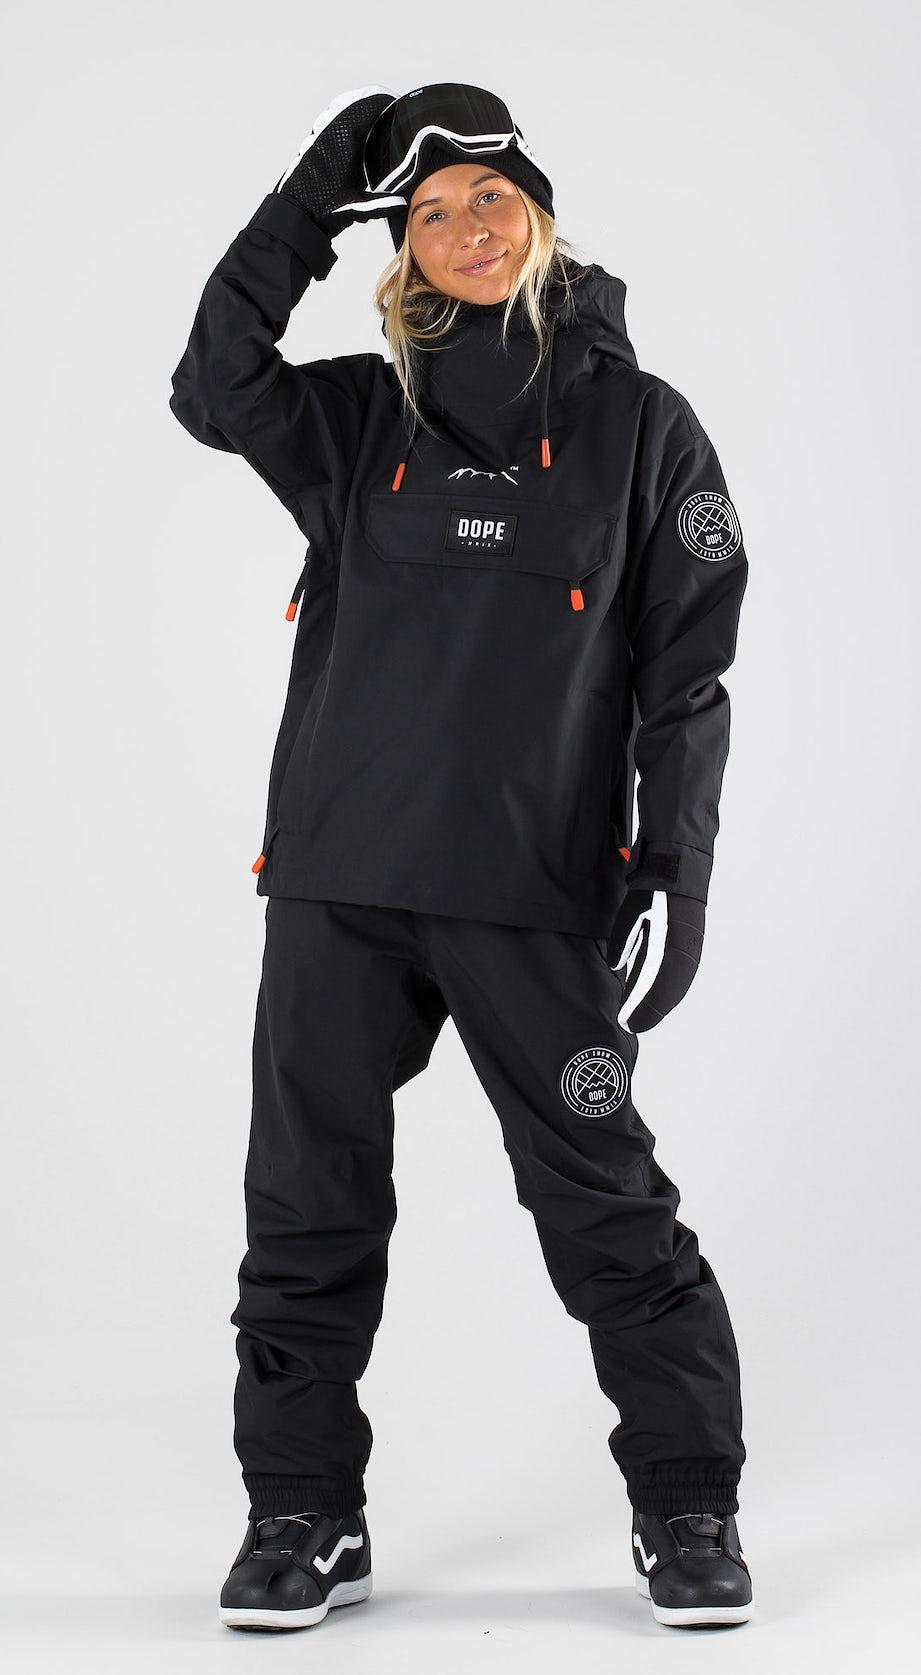 Dope Blizzard W Black Snowboard clothing Multi